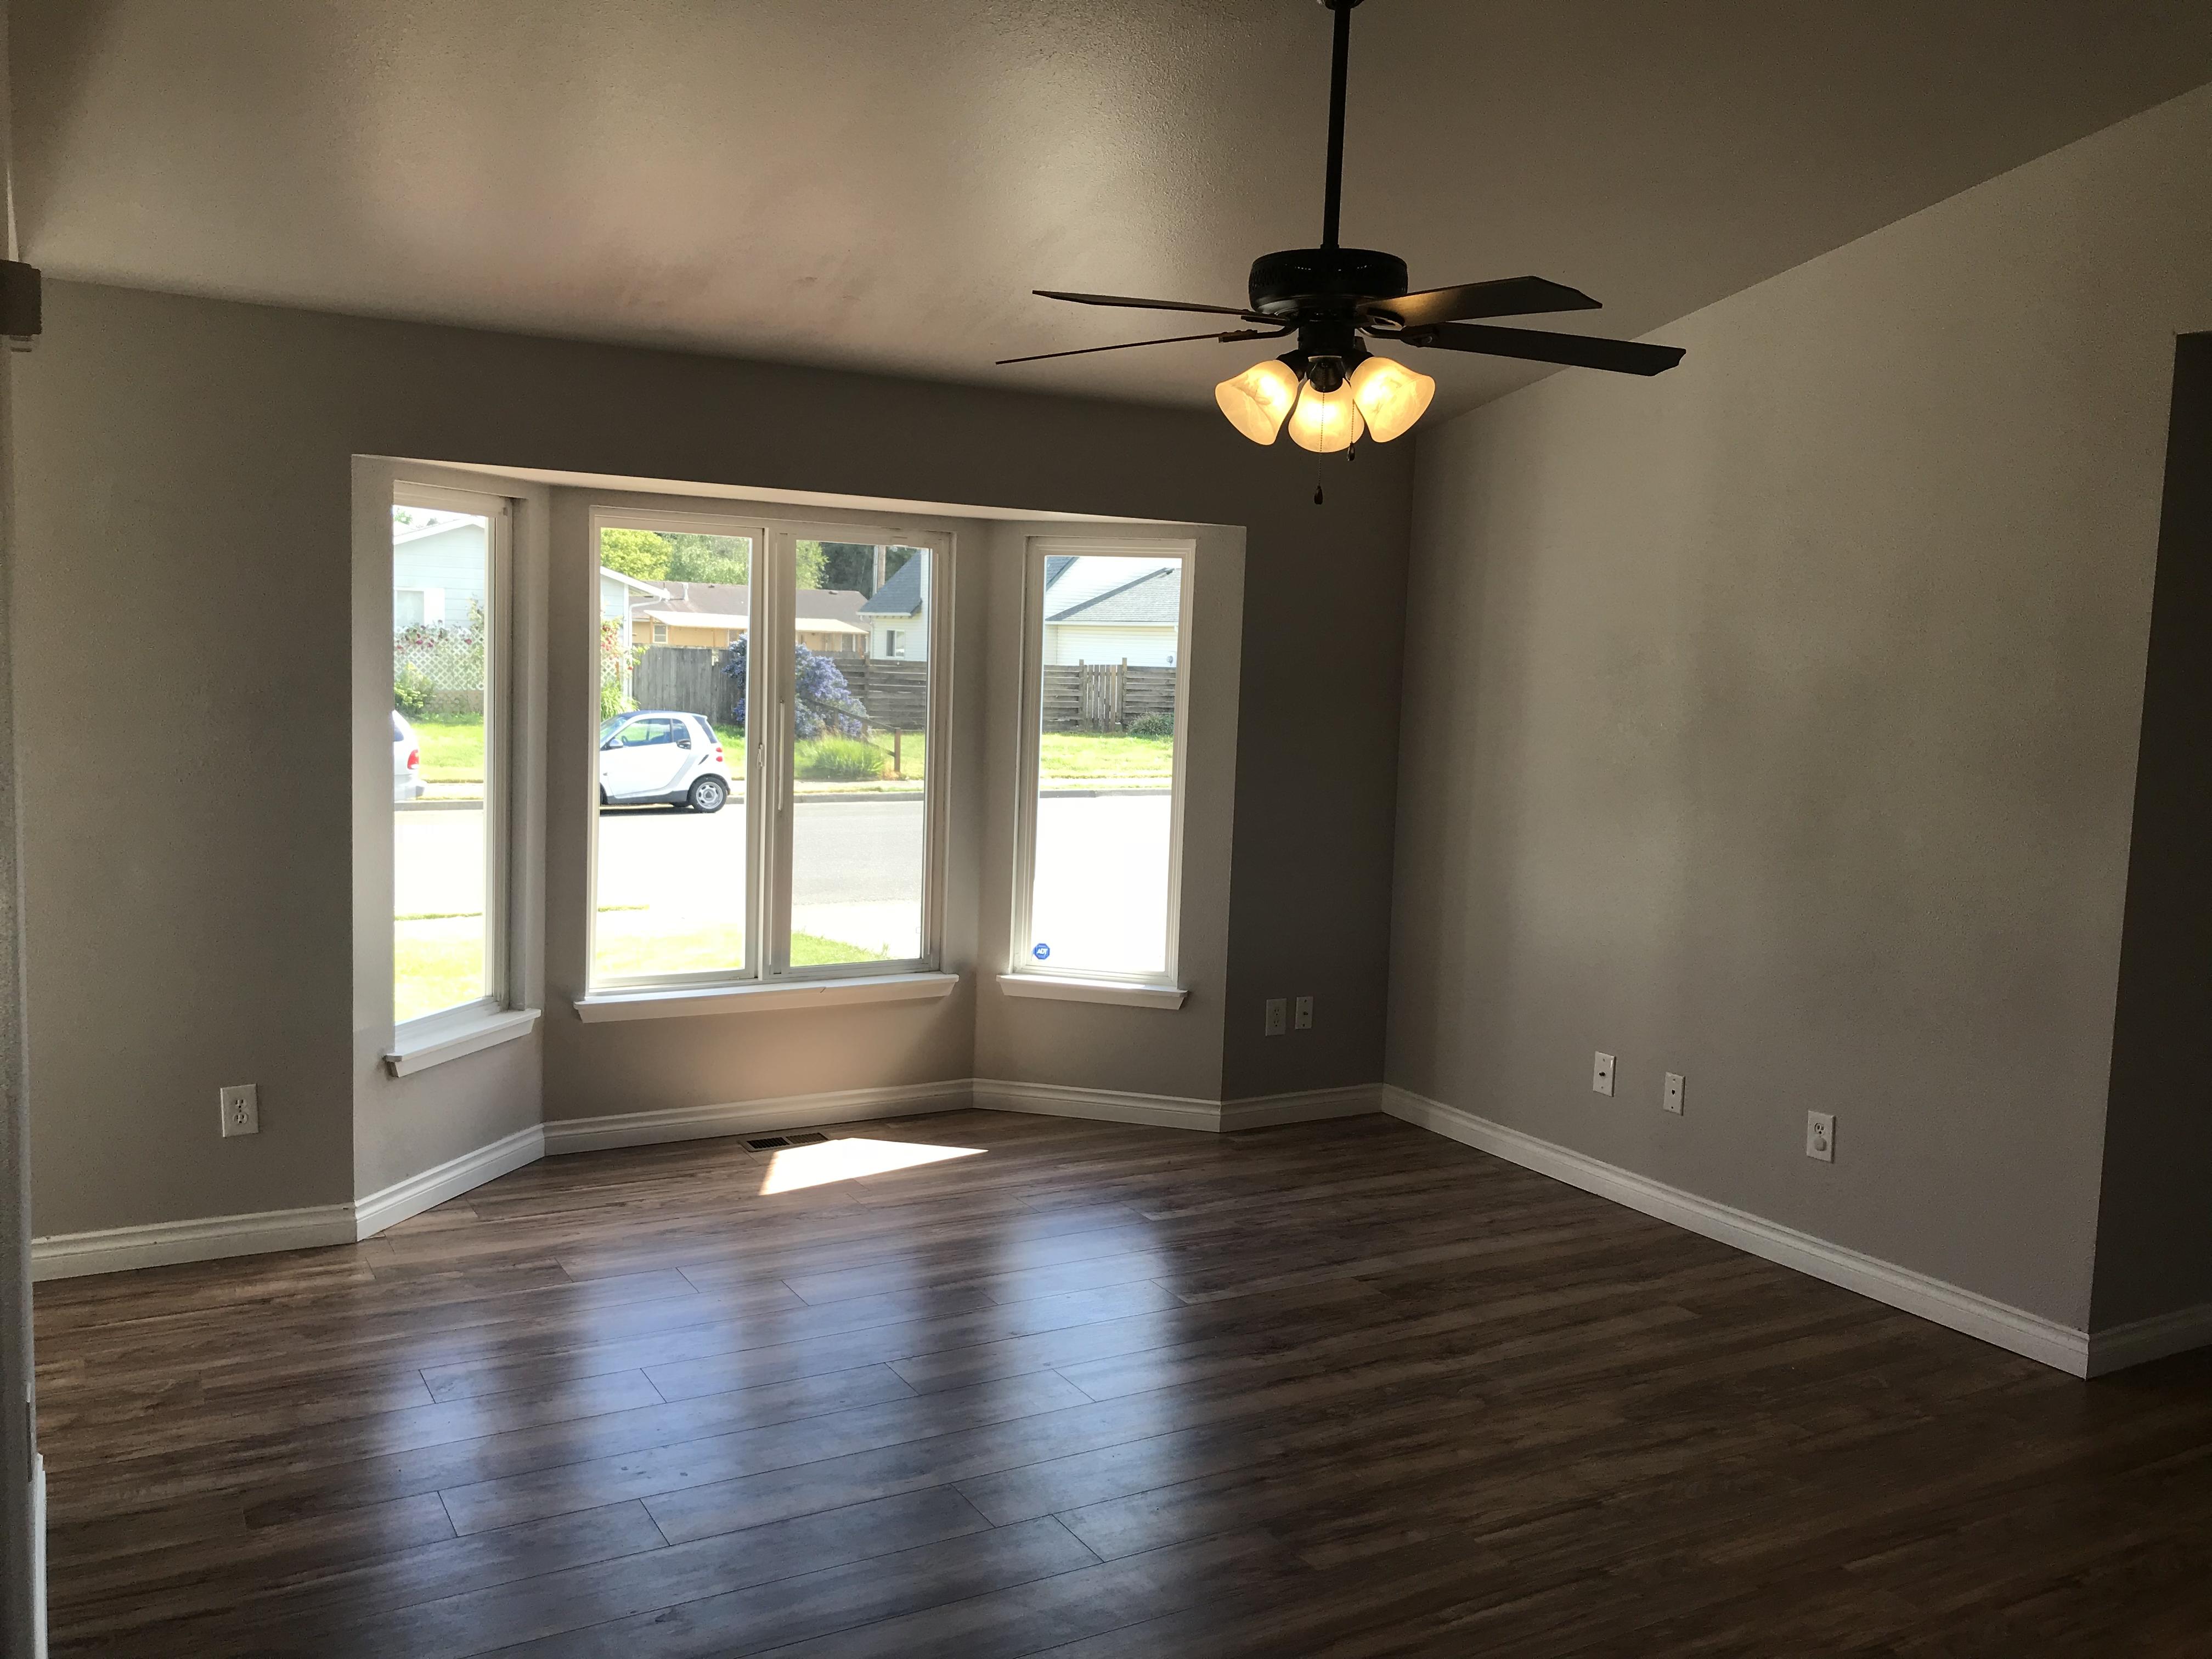 Photo of 1207 Kendra Ln, Burlington, WA, 98233